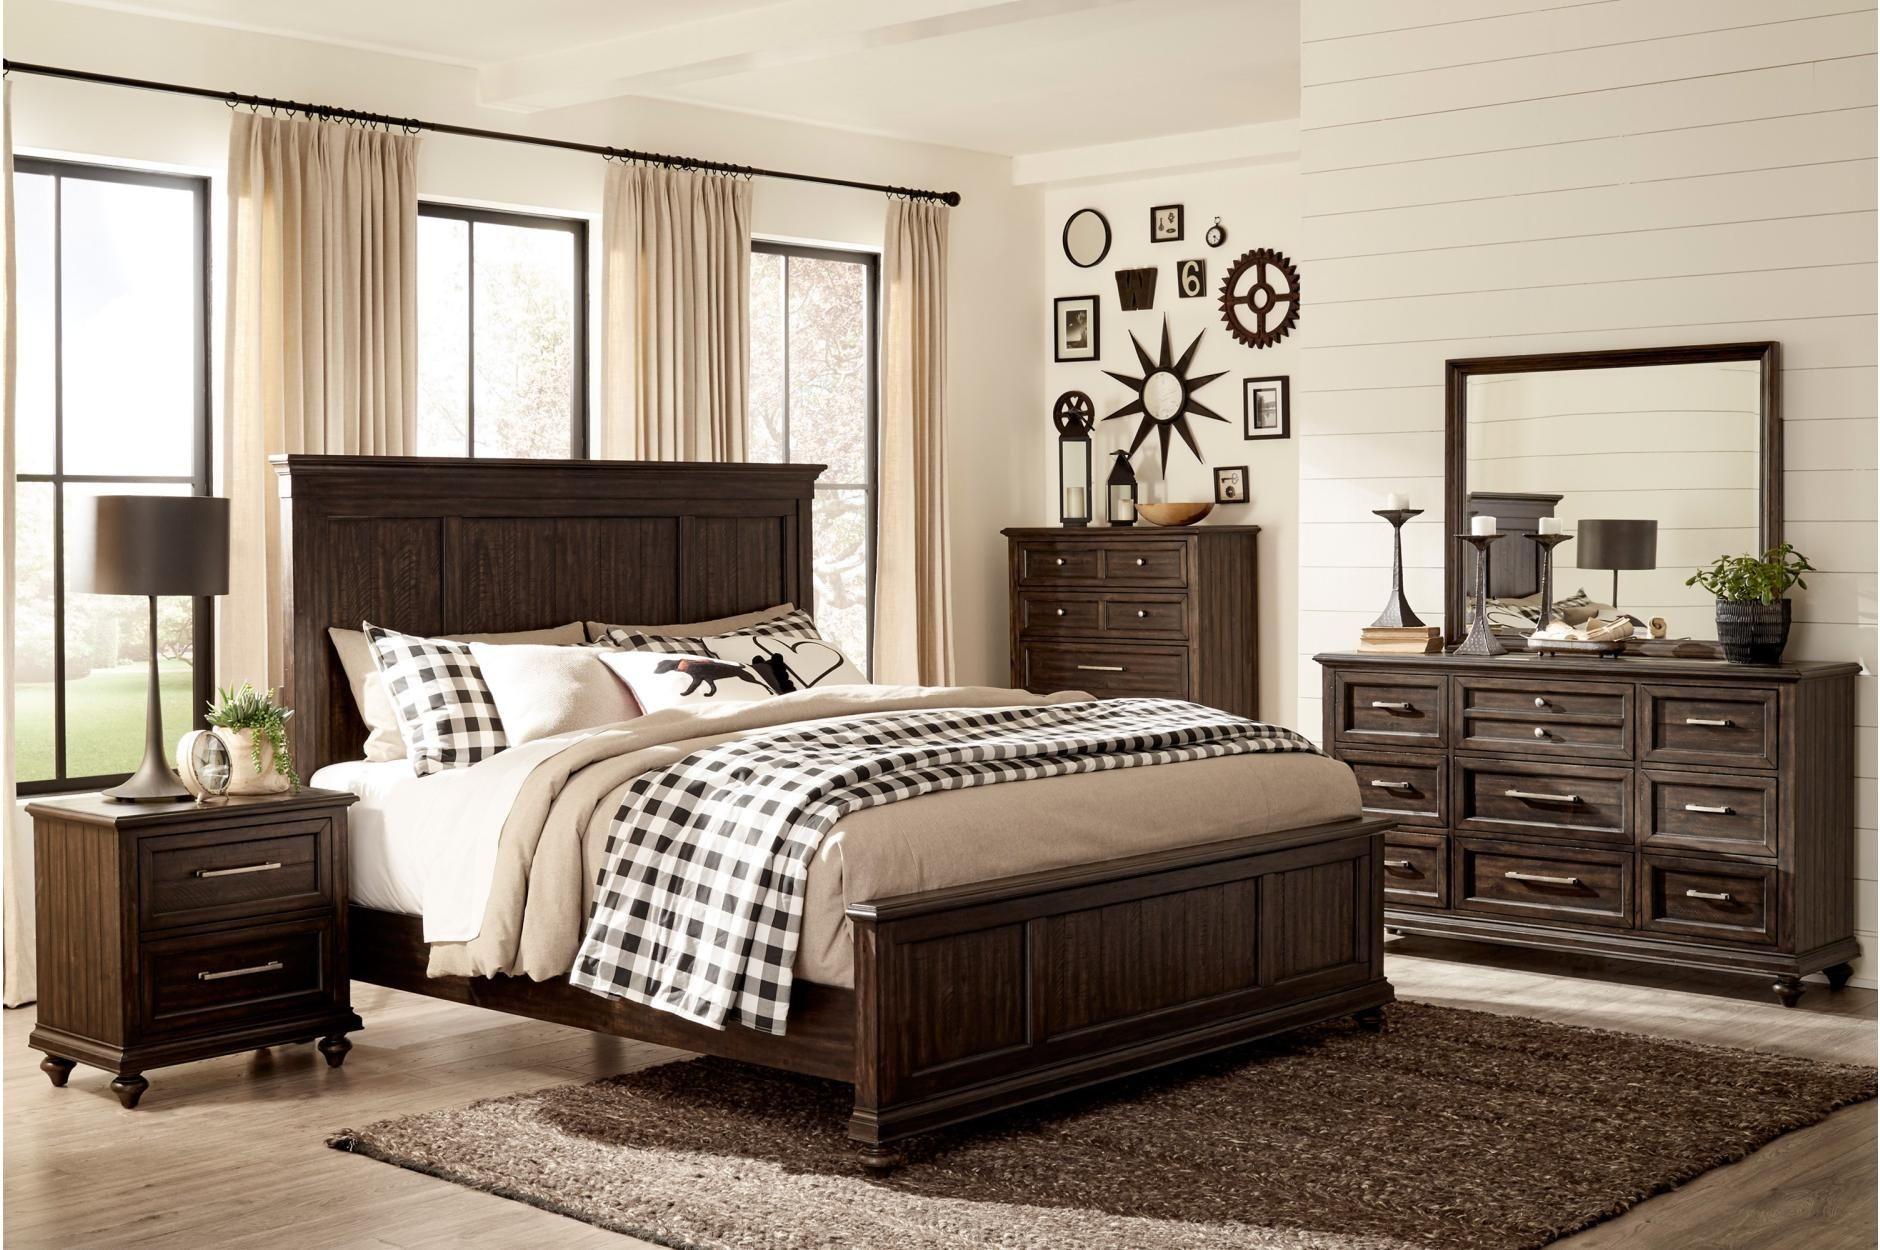 Homelegance Cardano Wood Bedroom Set Wood Bedroom Sets Bedroom